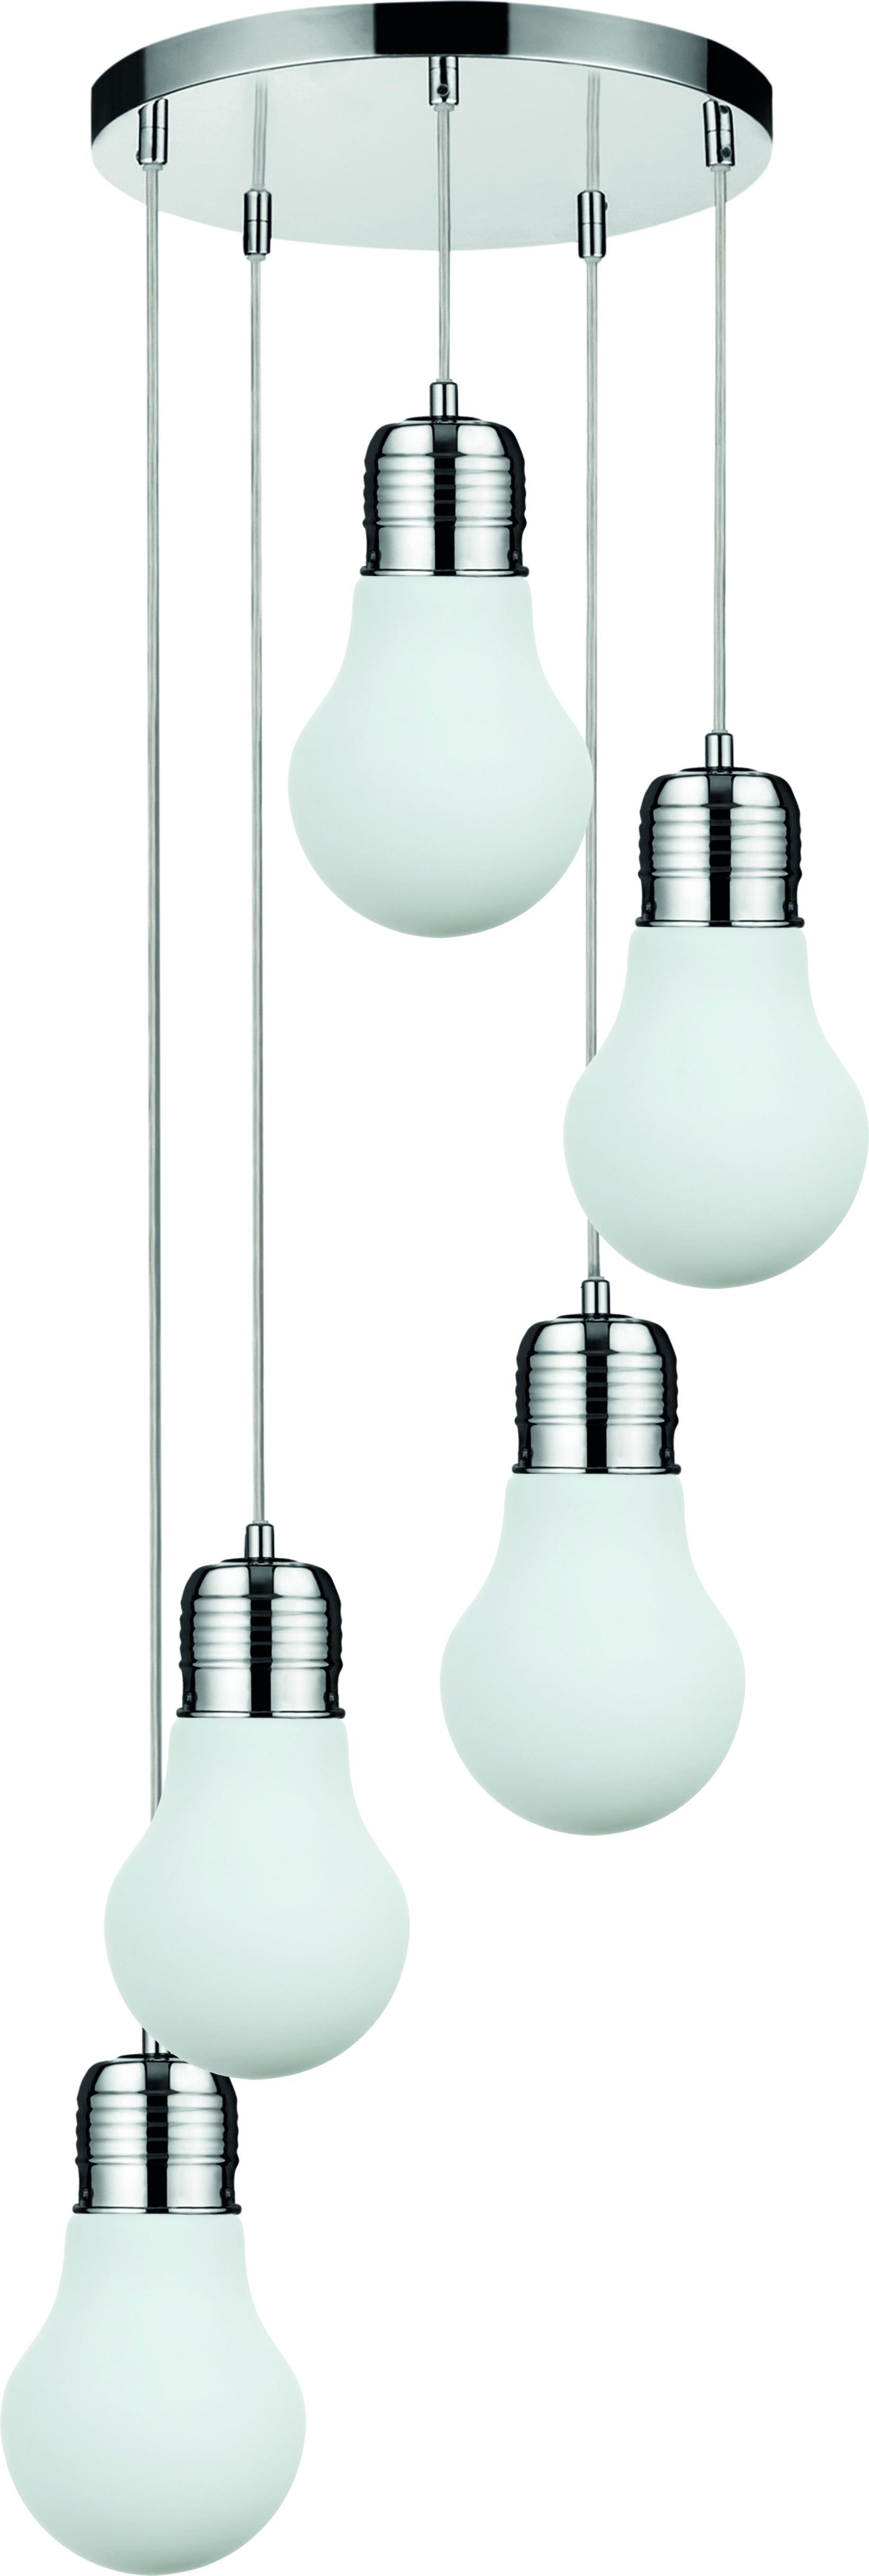 Five-point loft Pendant lamp Bulb chrome / white E27 60W